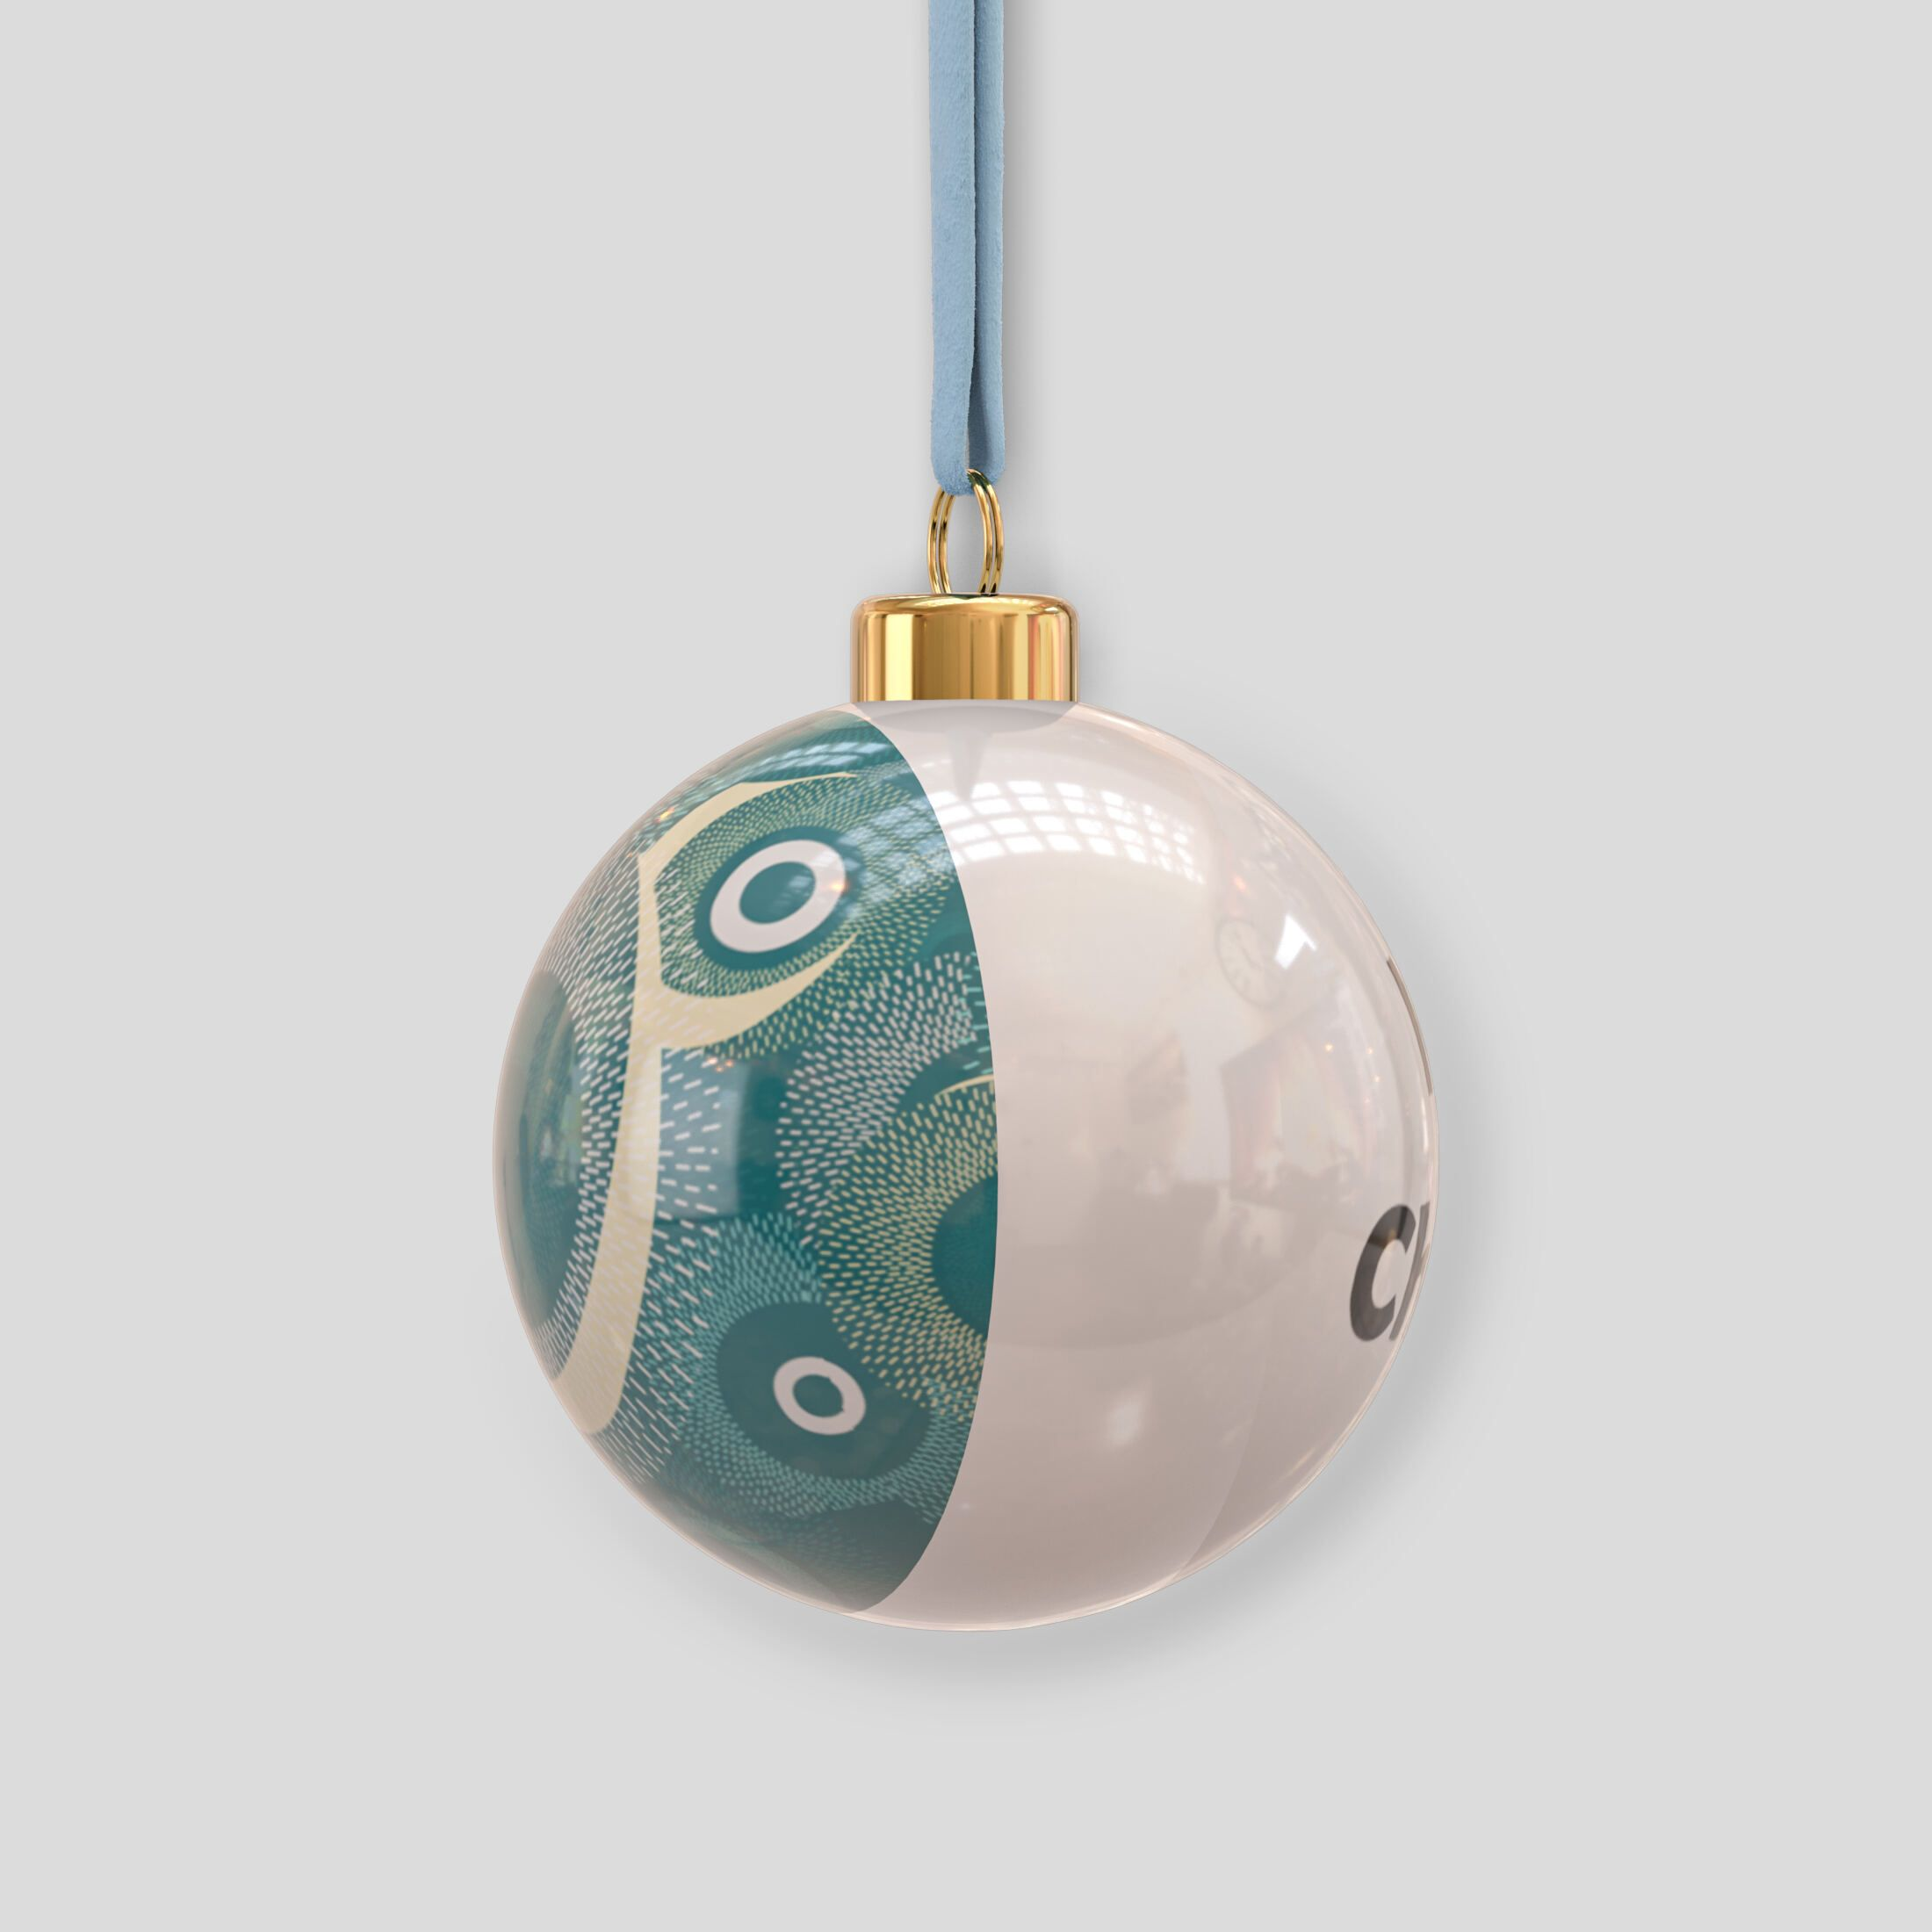 gepersonaliseerde kerstbal van porselein